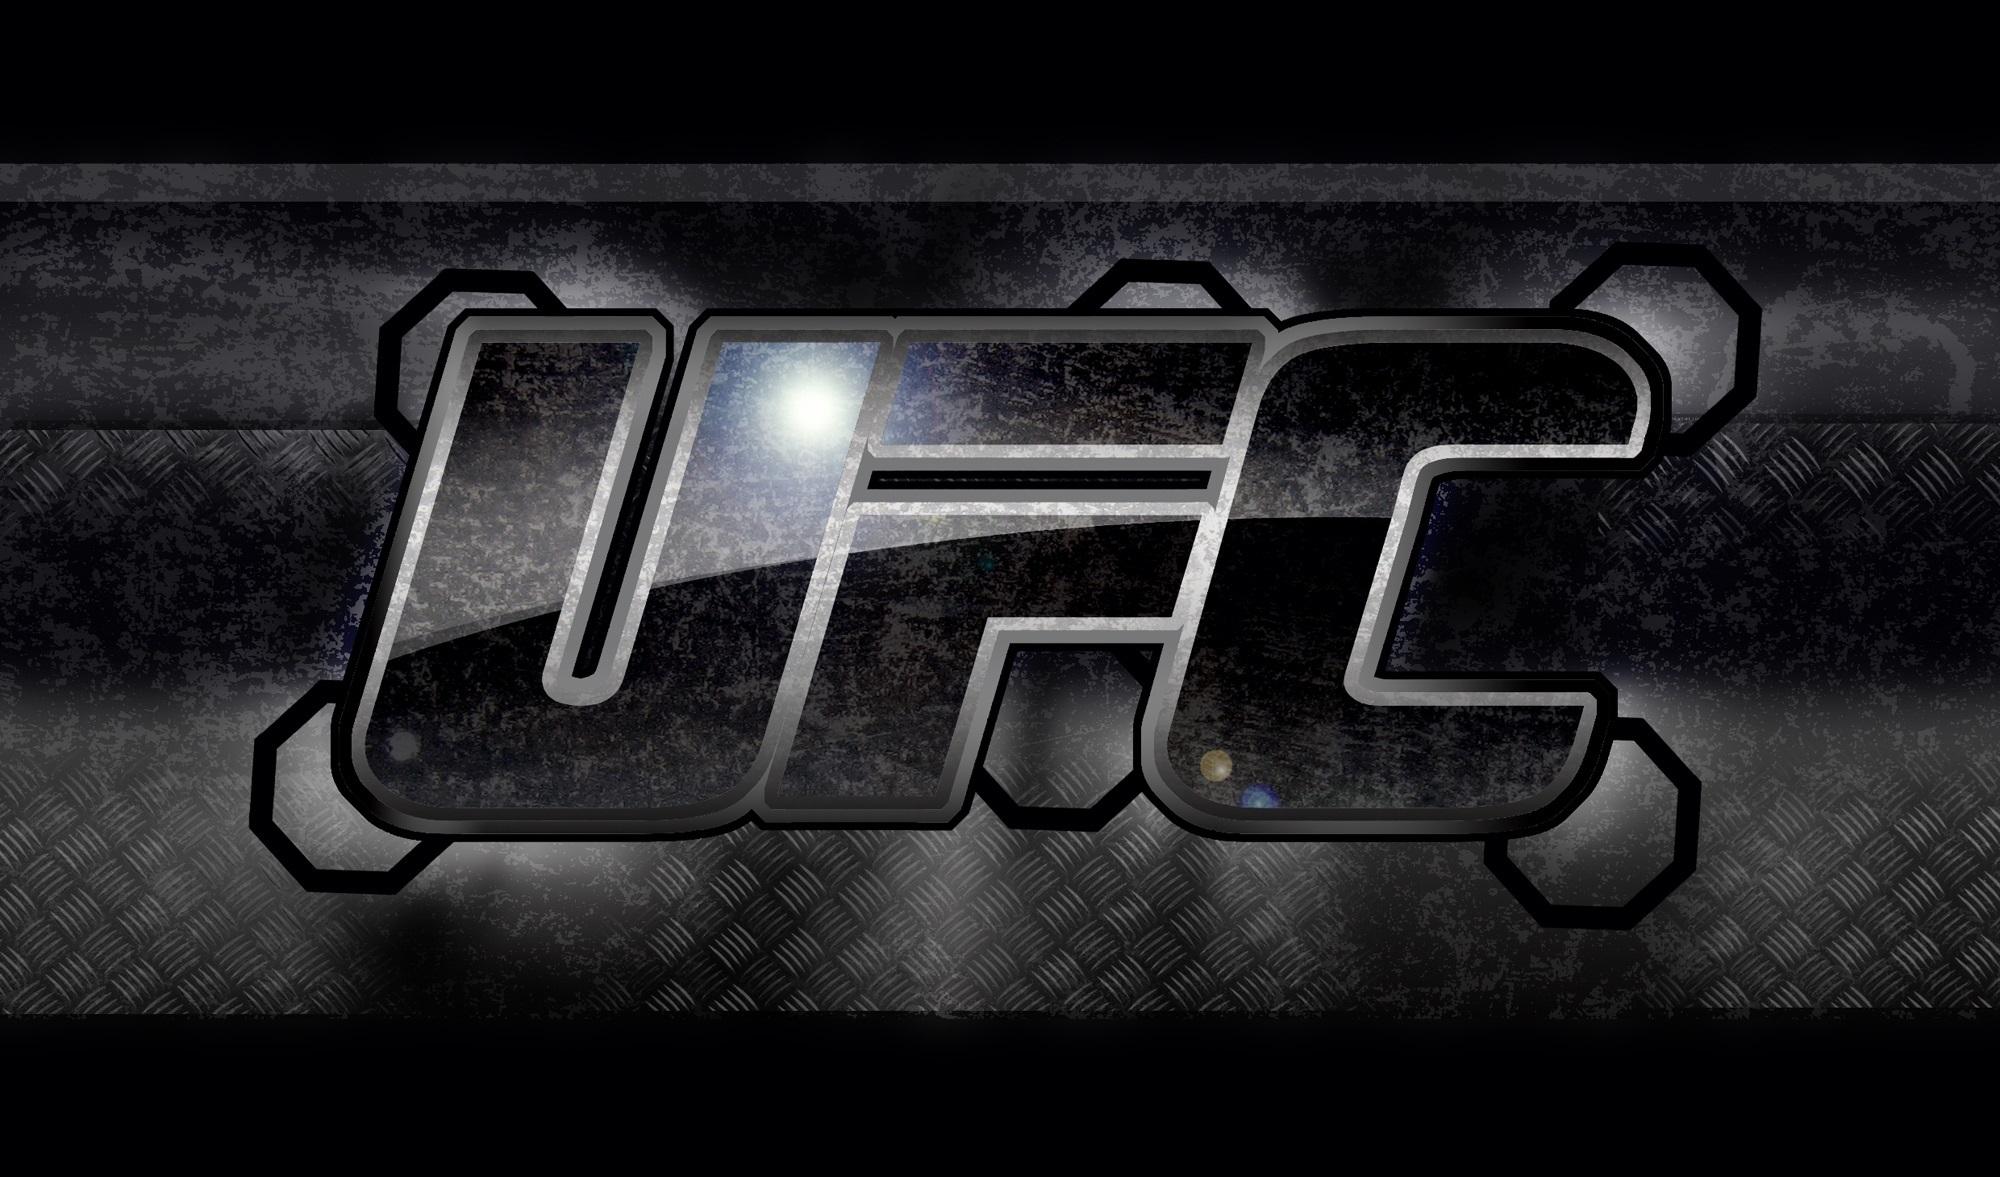 UFC mma battle martial arts action logo y wallpaper 2000x1177 2000x1177